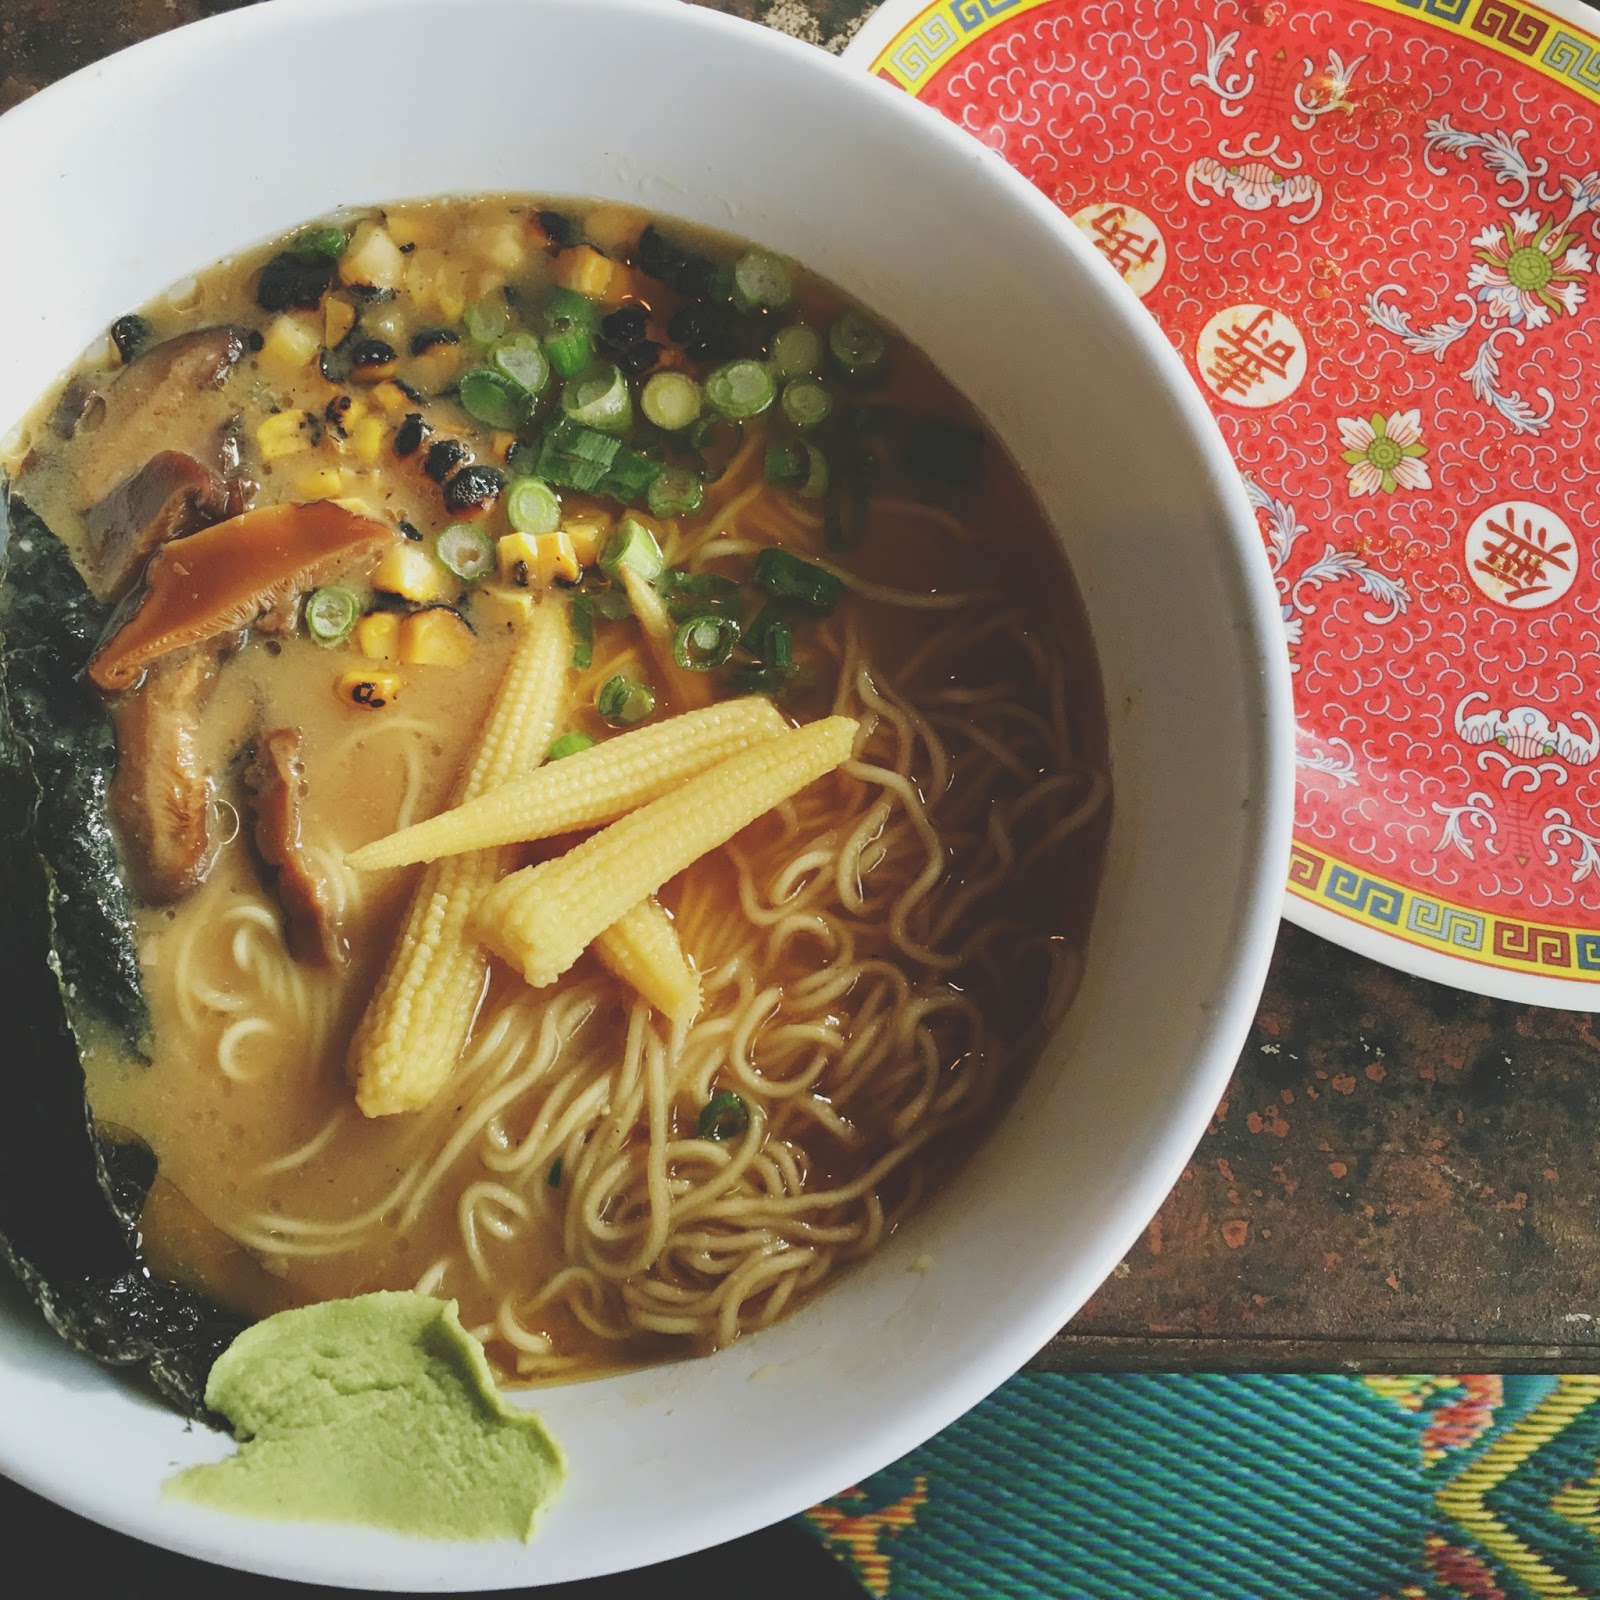 double miso ramen at Hot Joy - a restaurant in San Antonio, Texas